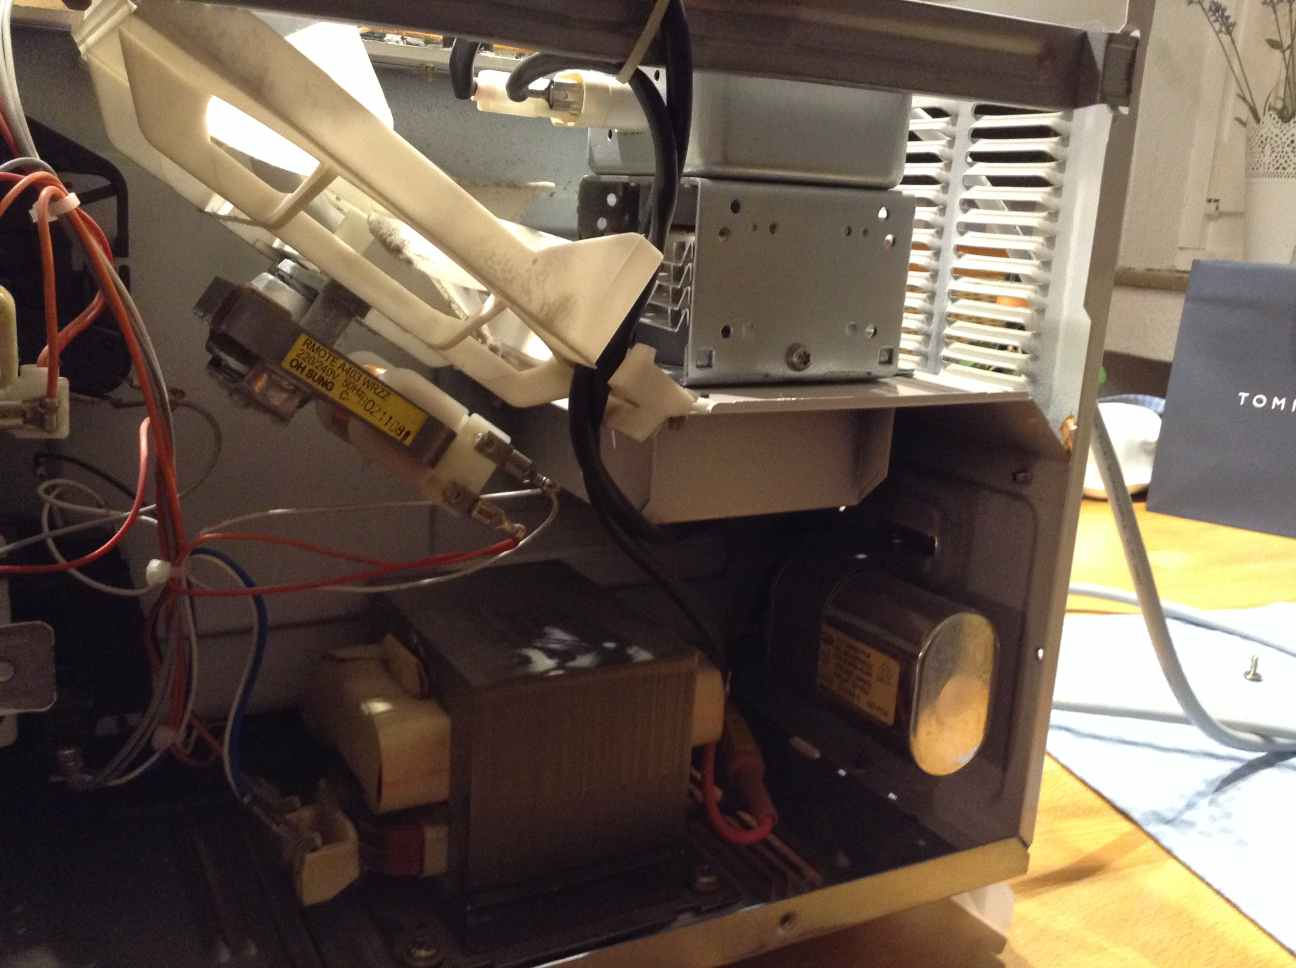 Mikrowelle defekt kalt